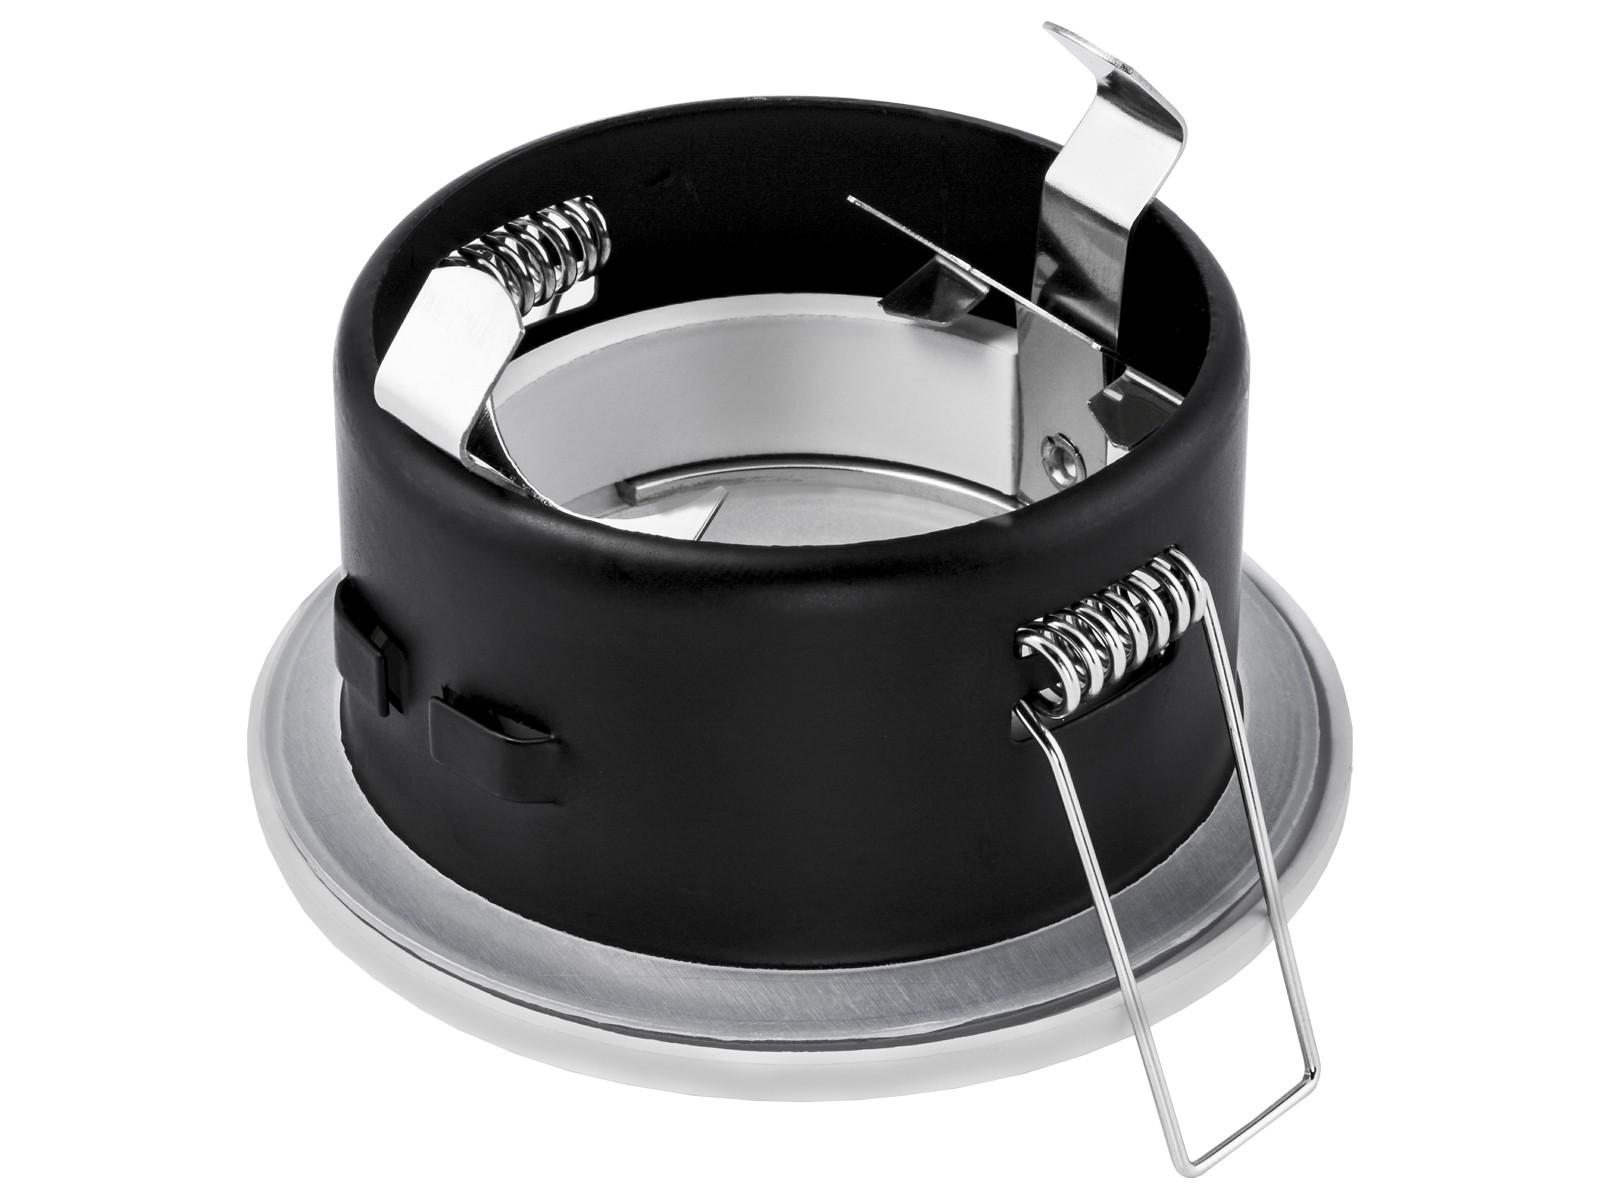 led einbaustrahler ip65 neutralwei gu10 6w 230v edelstahl optik rund starr. Black Bedroom Furniture Sets. Home Design Ideas